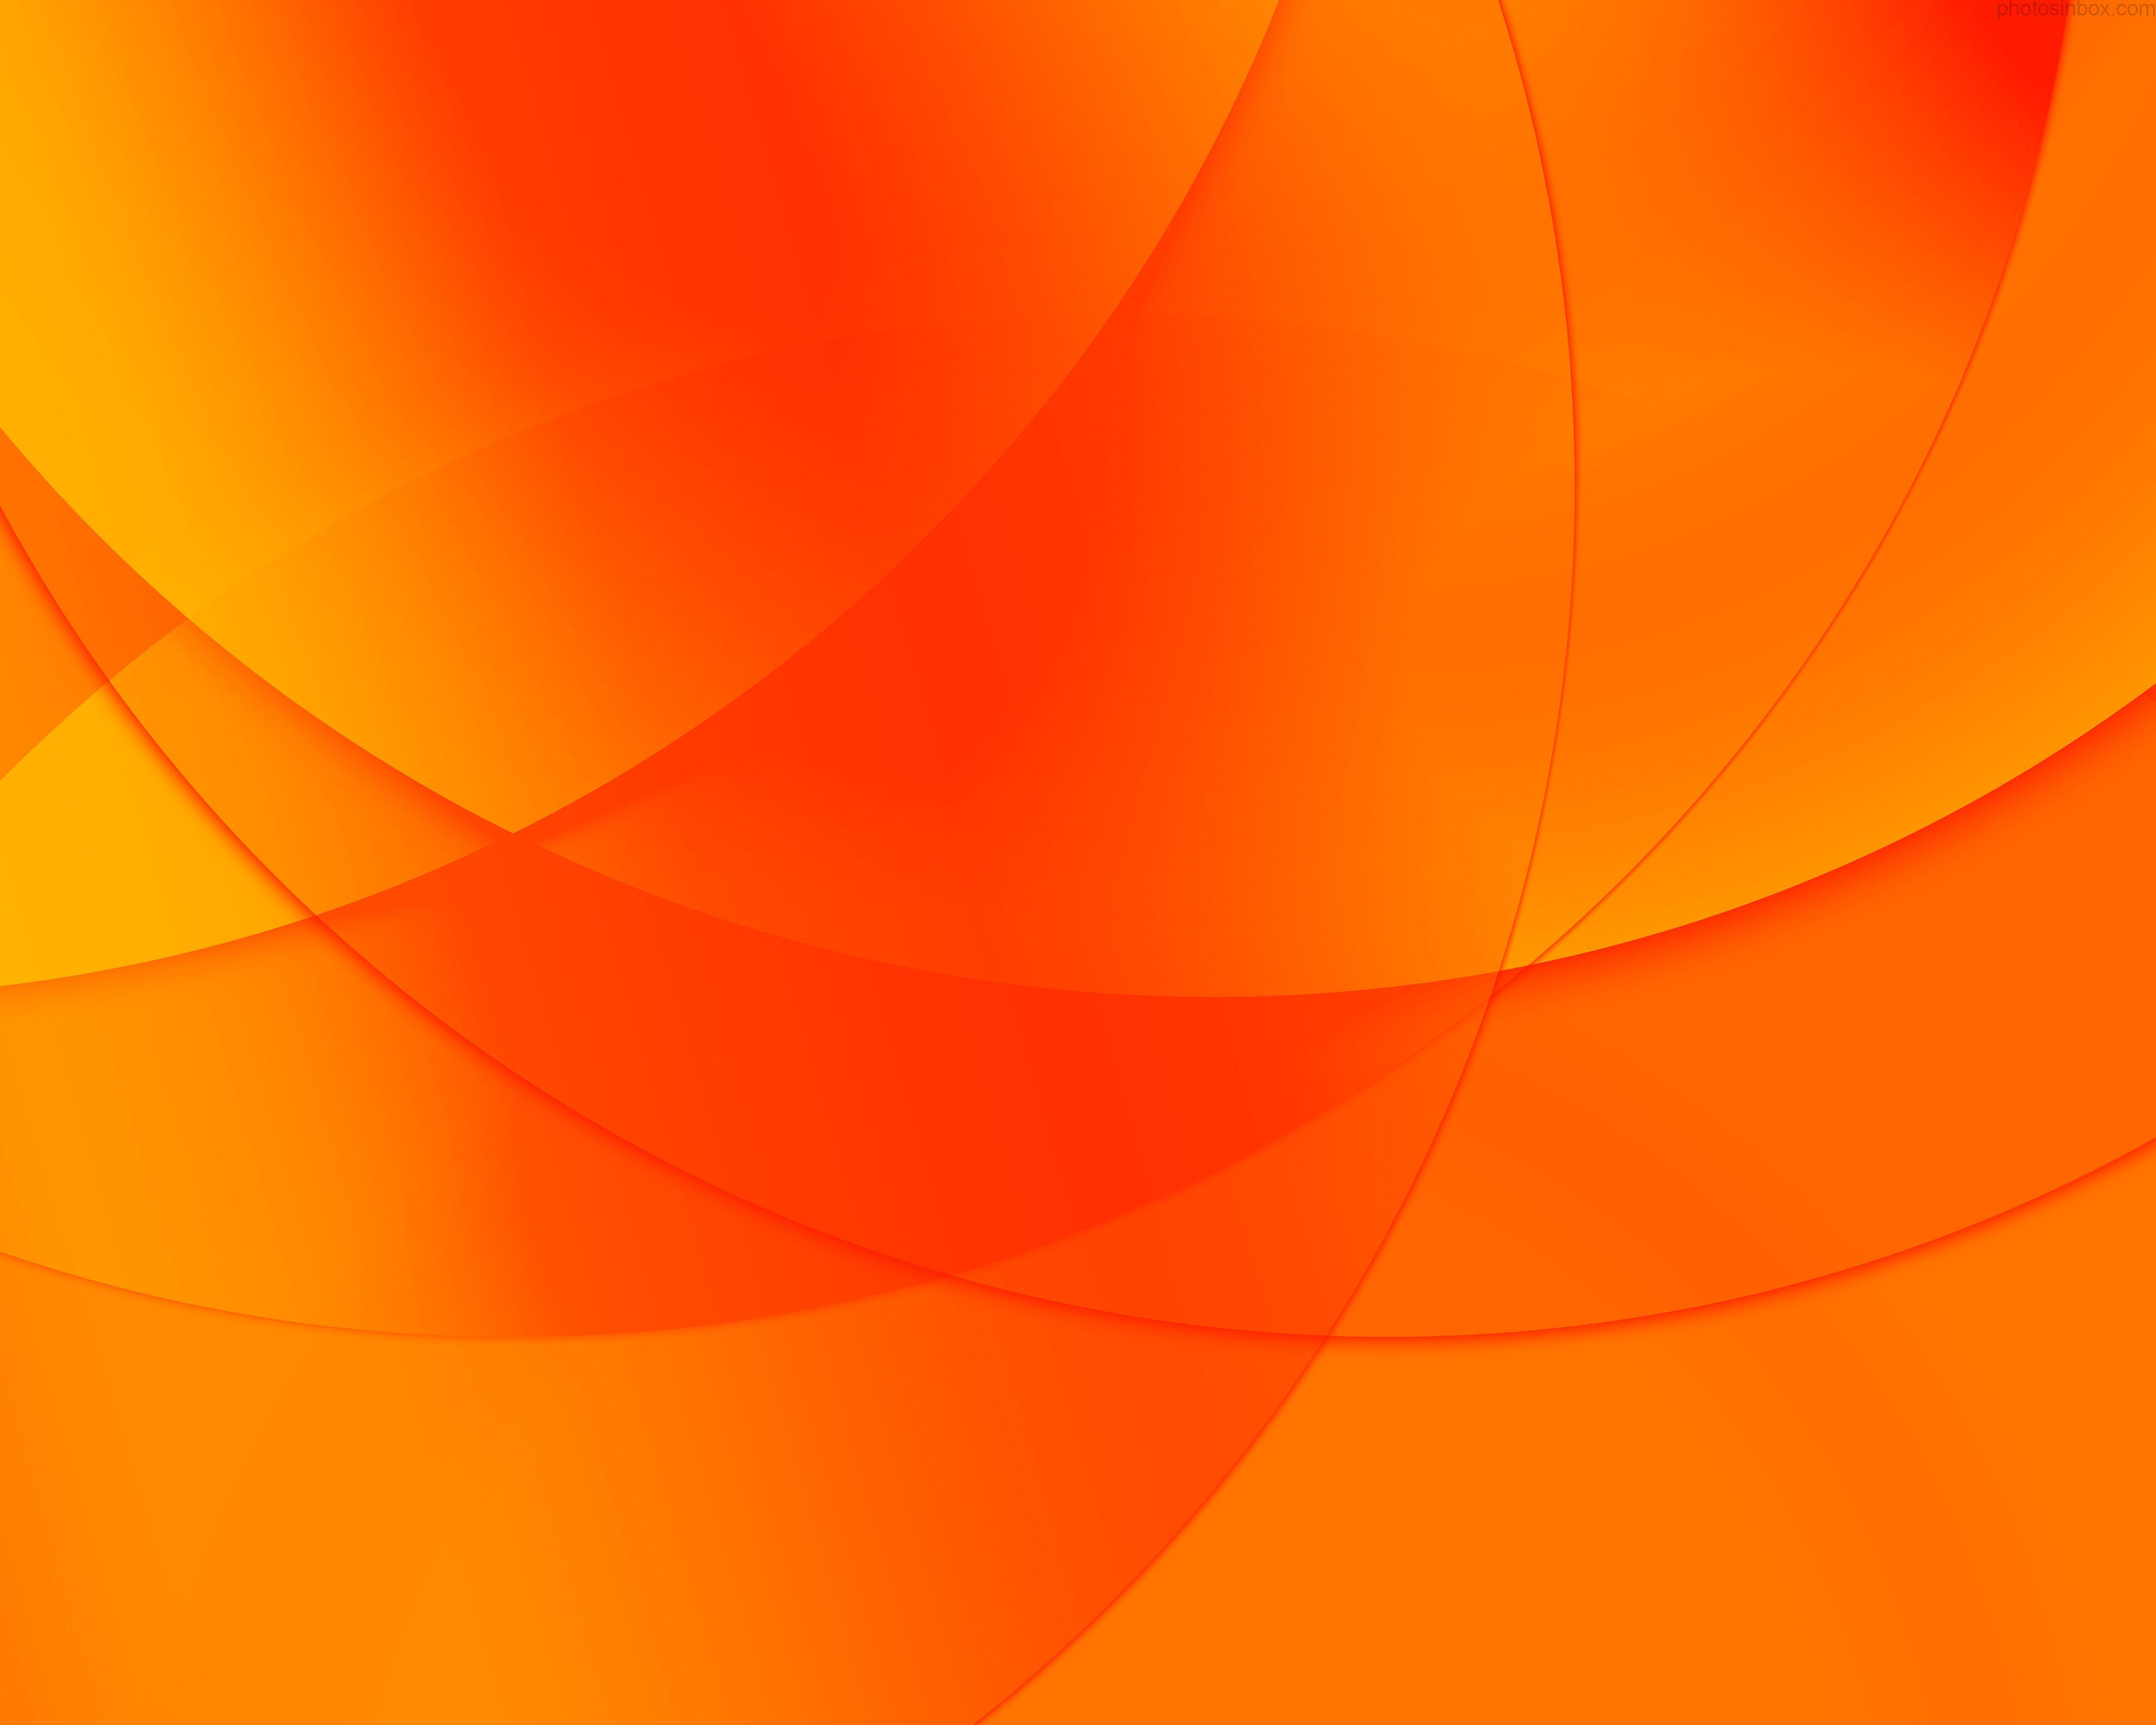 Orange Backgrounds Image - Wallpaper Cave